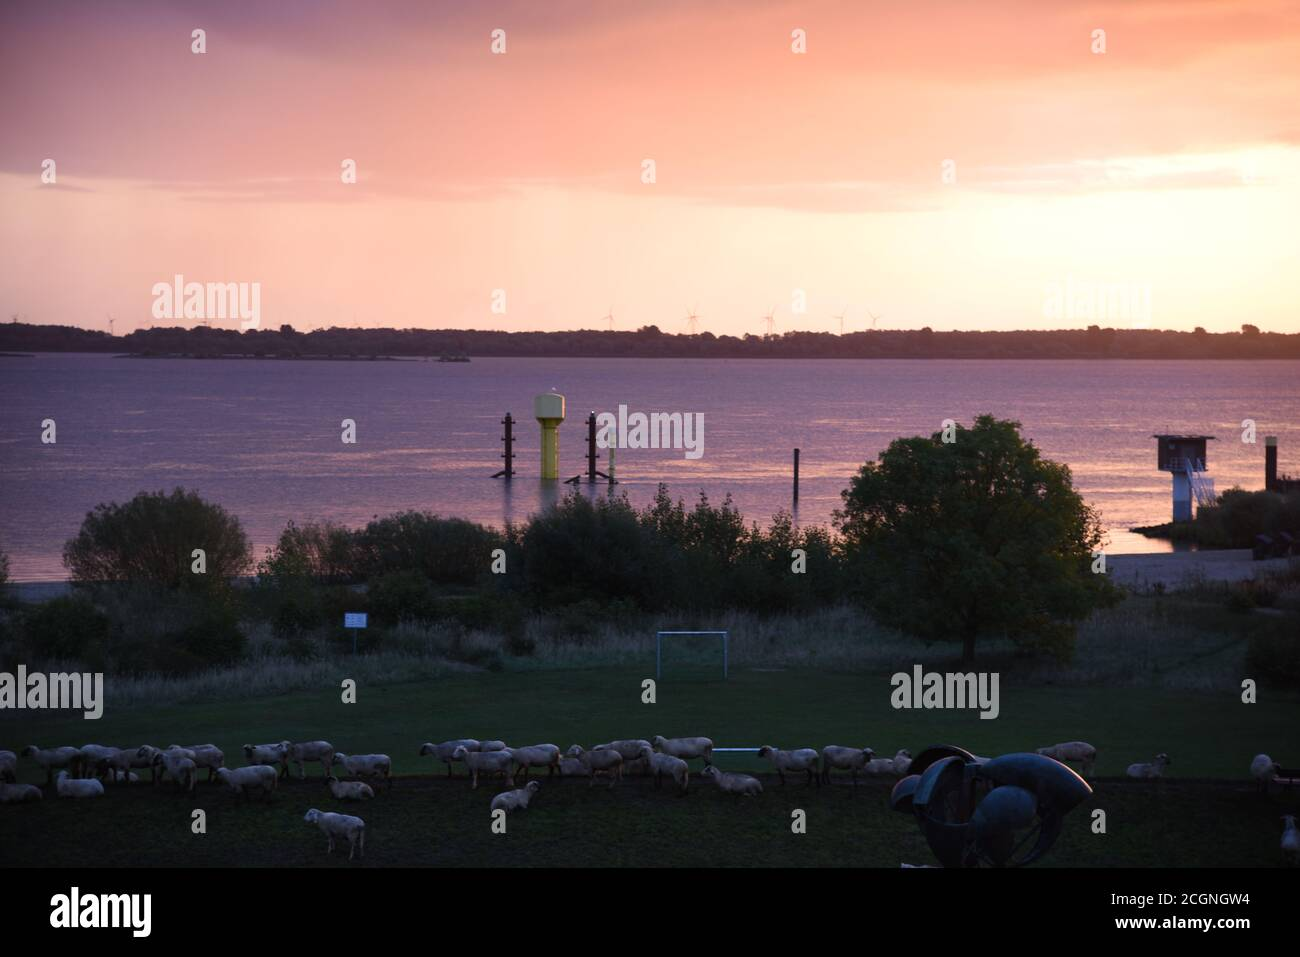 Schöne Wetteratmosphäre in Krautsand Stockfoto